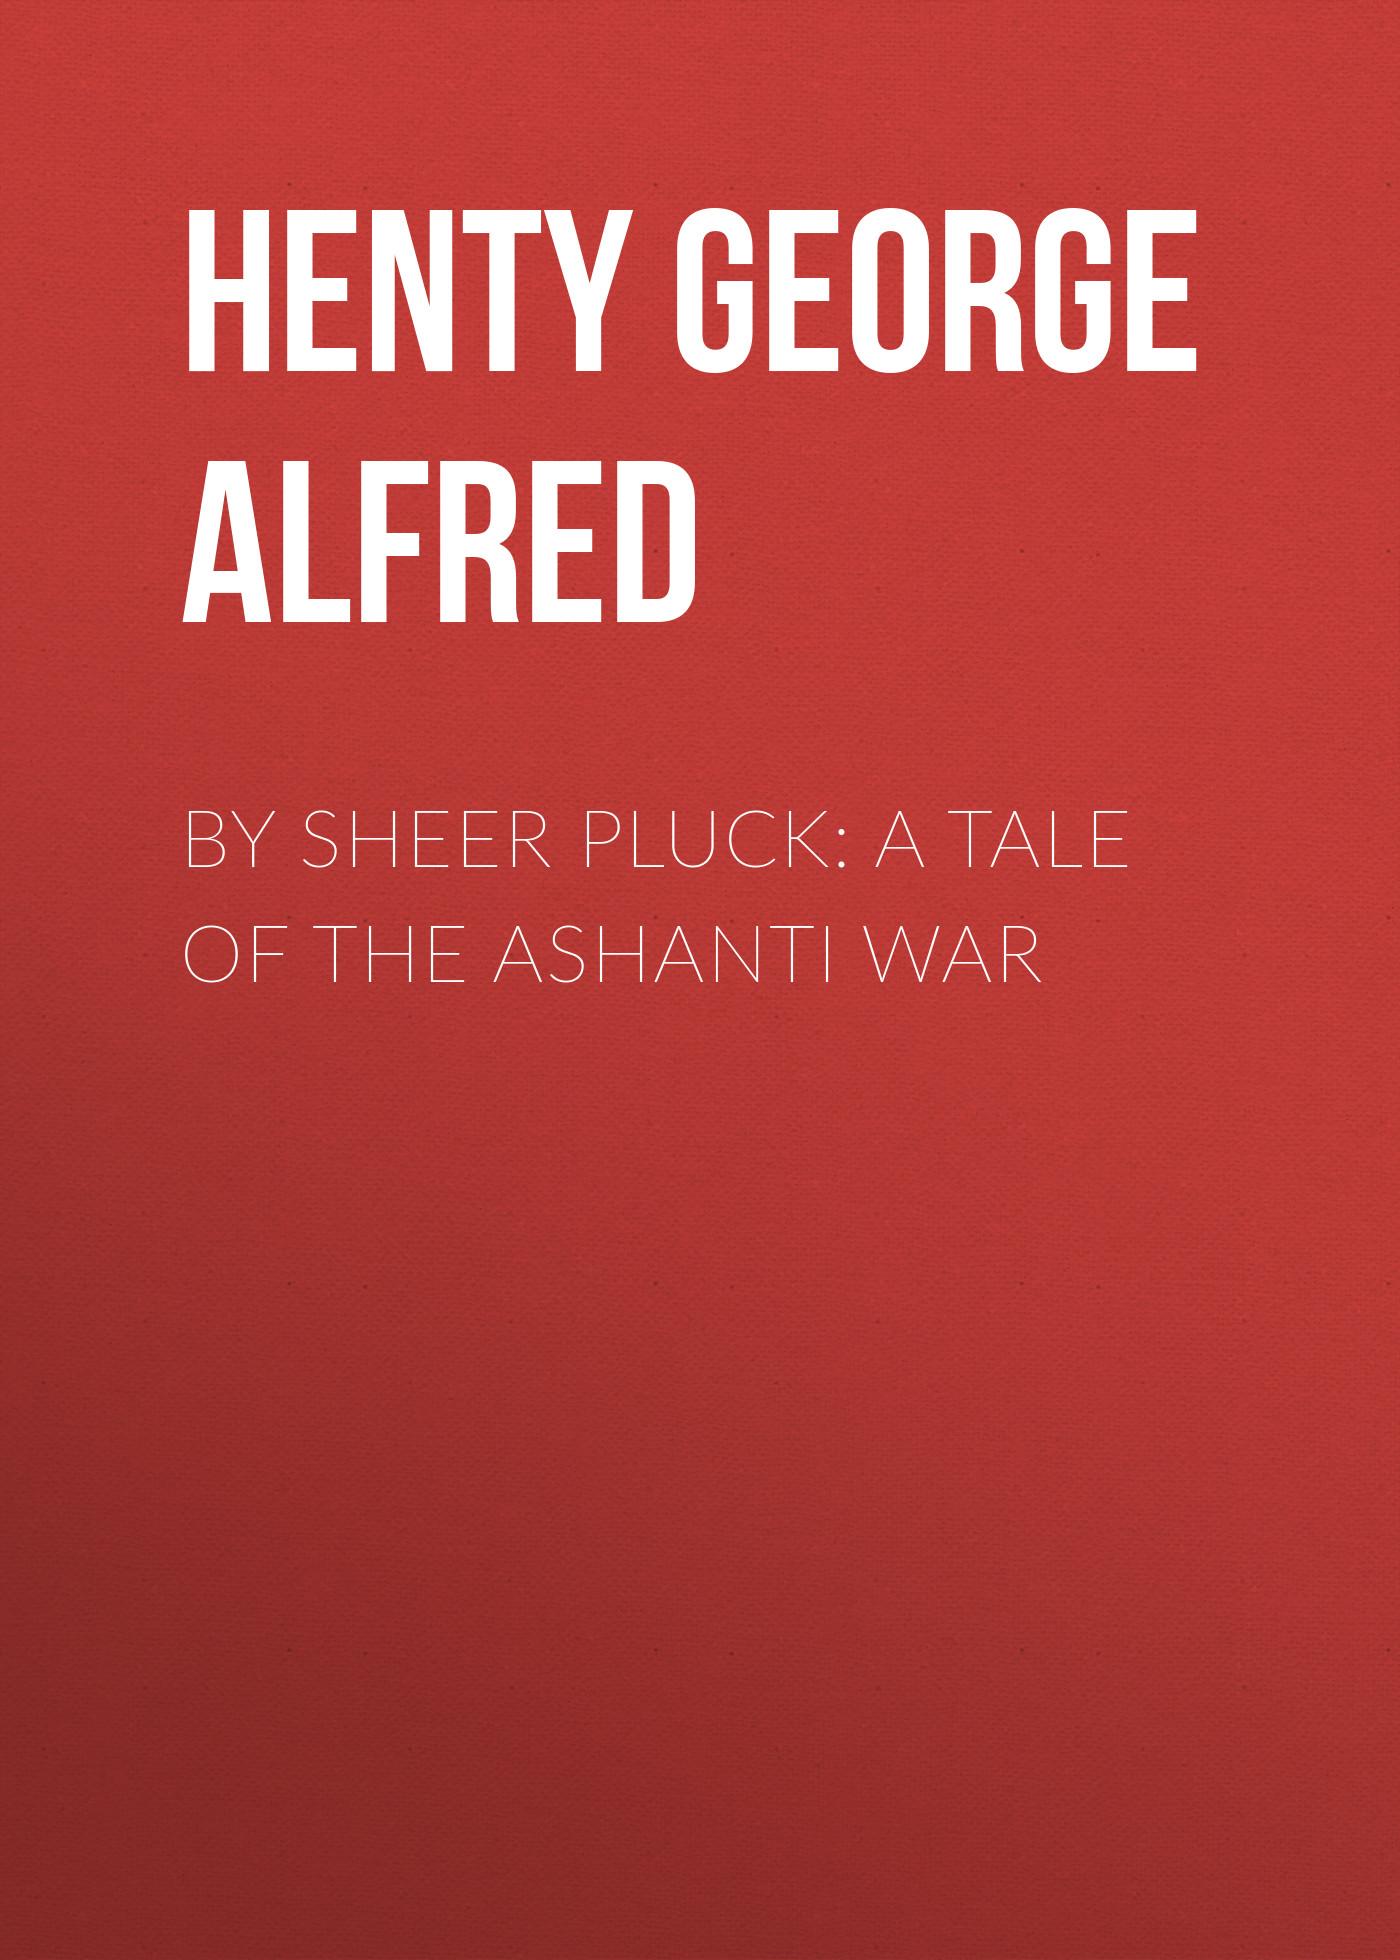 Henty George Alfred By Sheer Pluck: A Tale of the Ashanti War цена в Москве и Питере